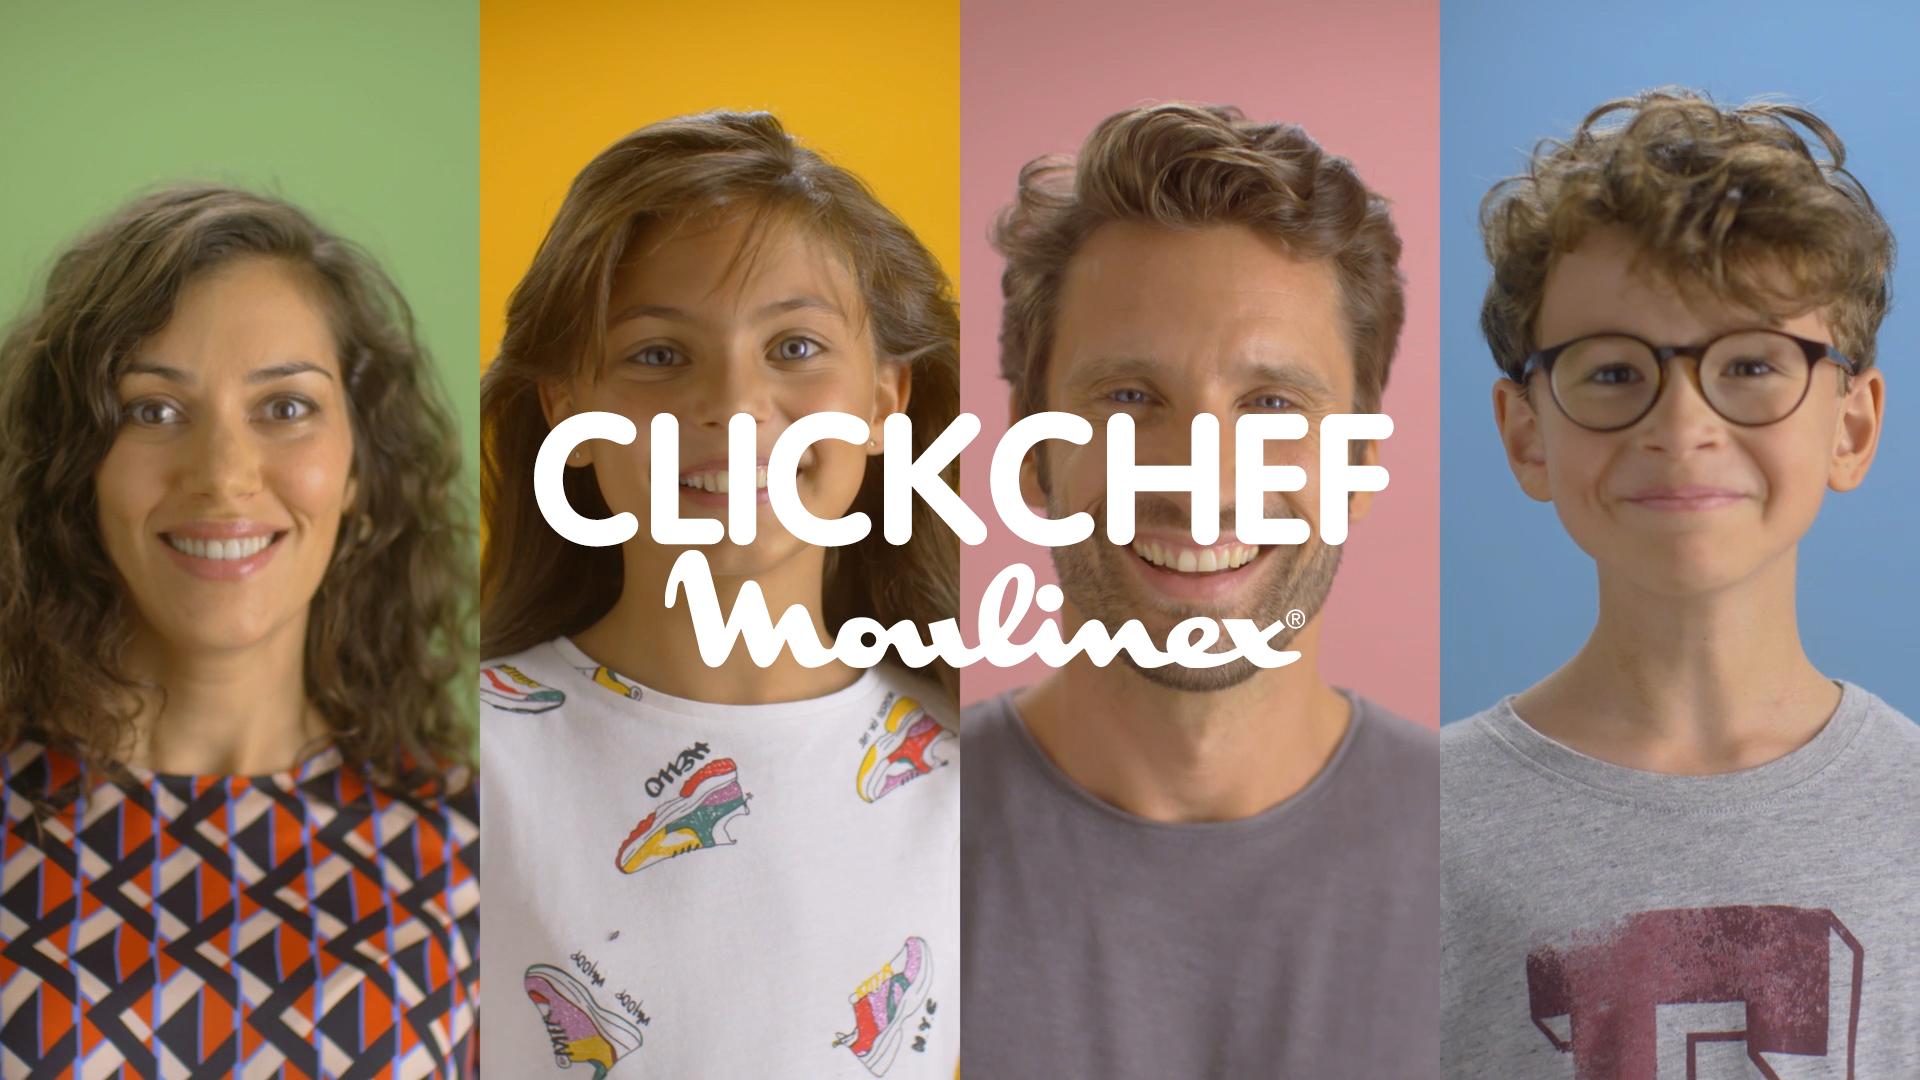 ClickChef